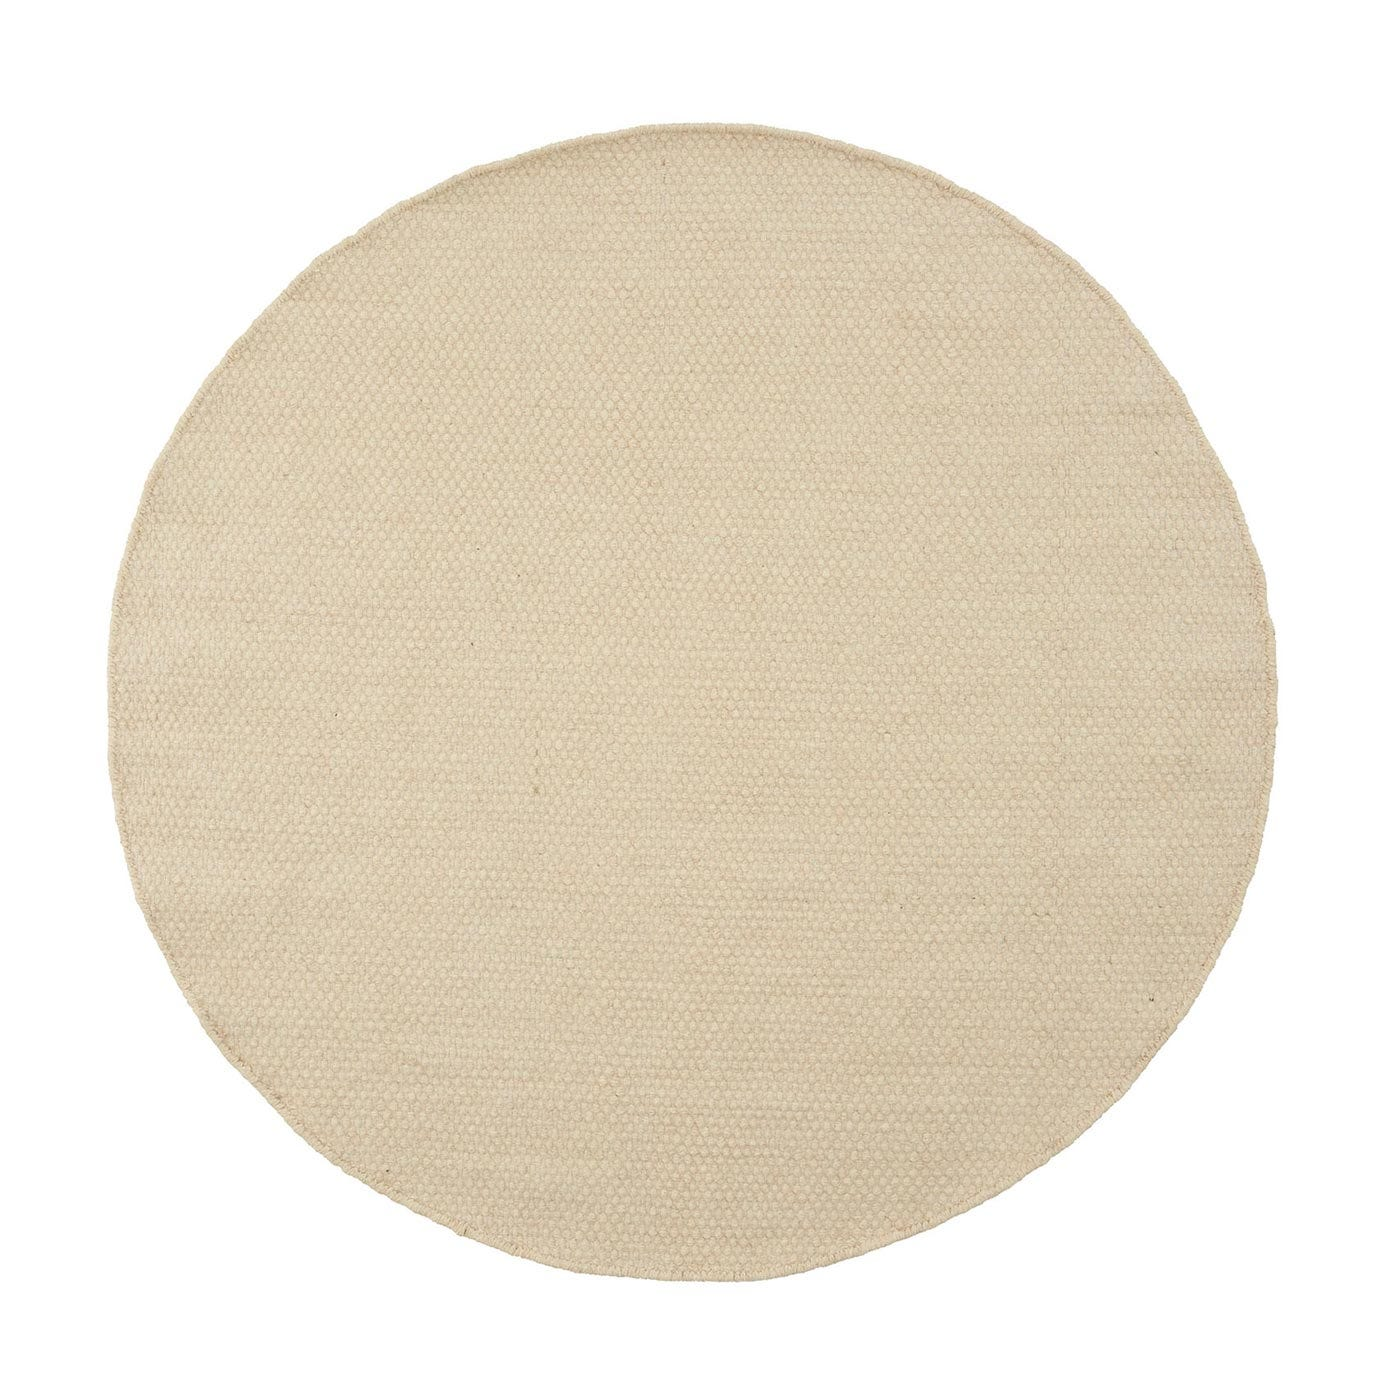 Asko Round Rug White